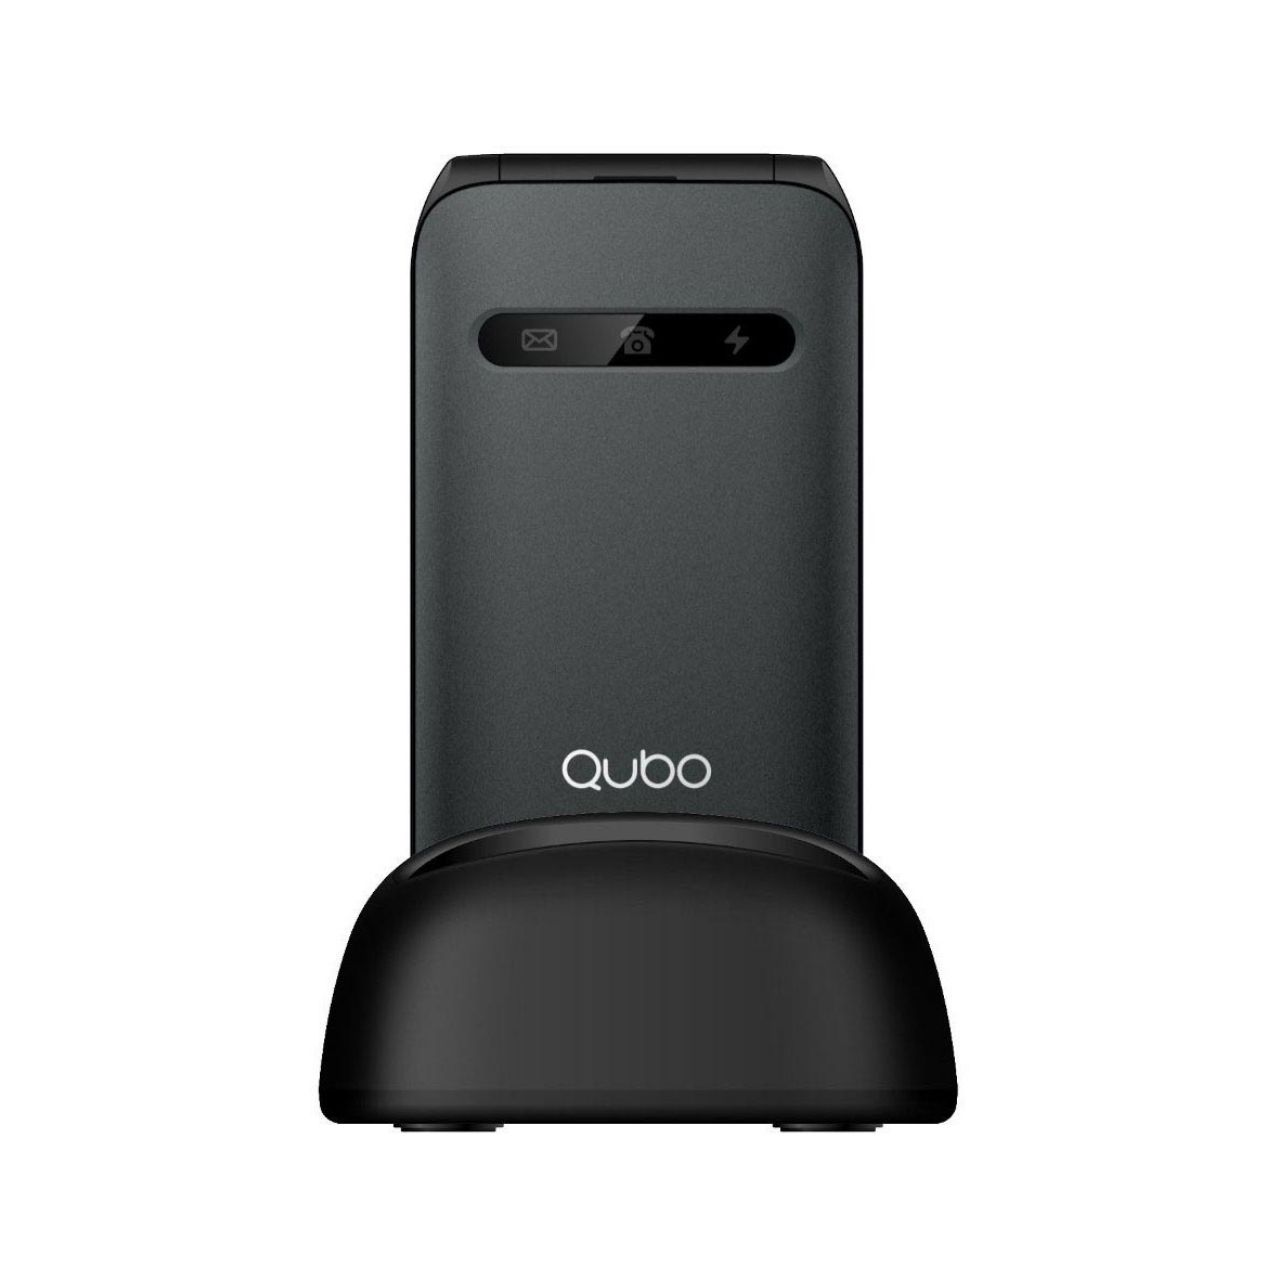 Qubo Teléfono Móvil X-209, Dual SIM, Negro + Base de Carga